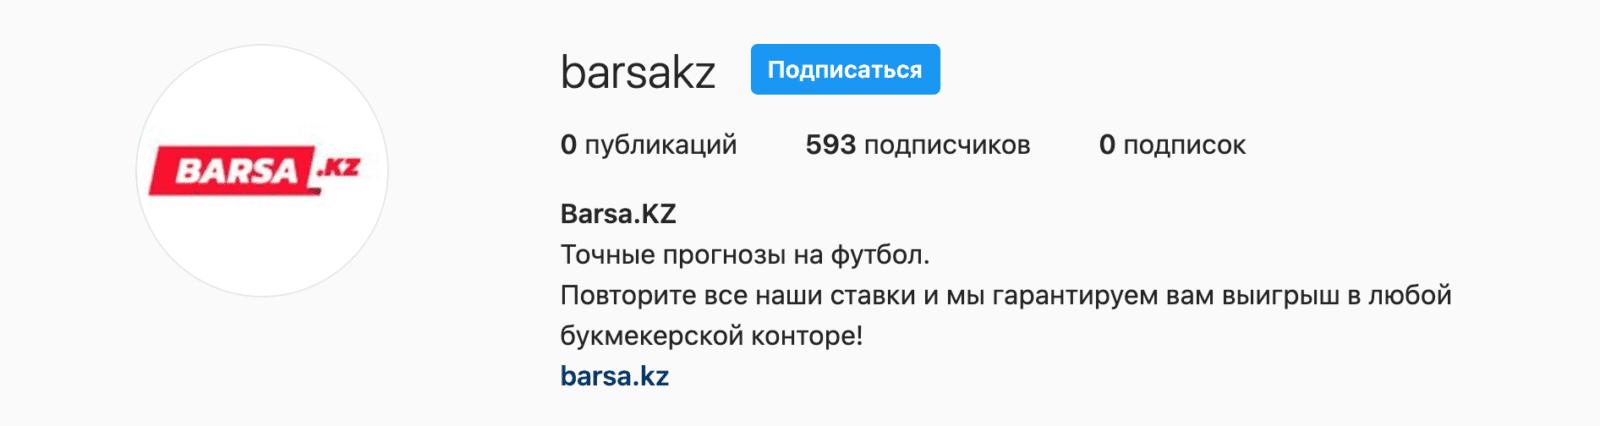 Инстаграм аккаунт www Barsa kz (Барса кз)